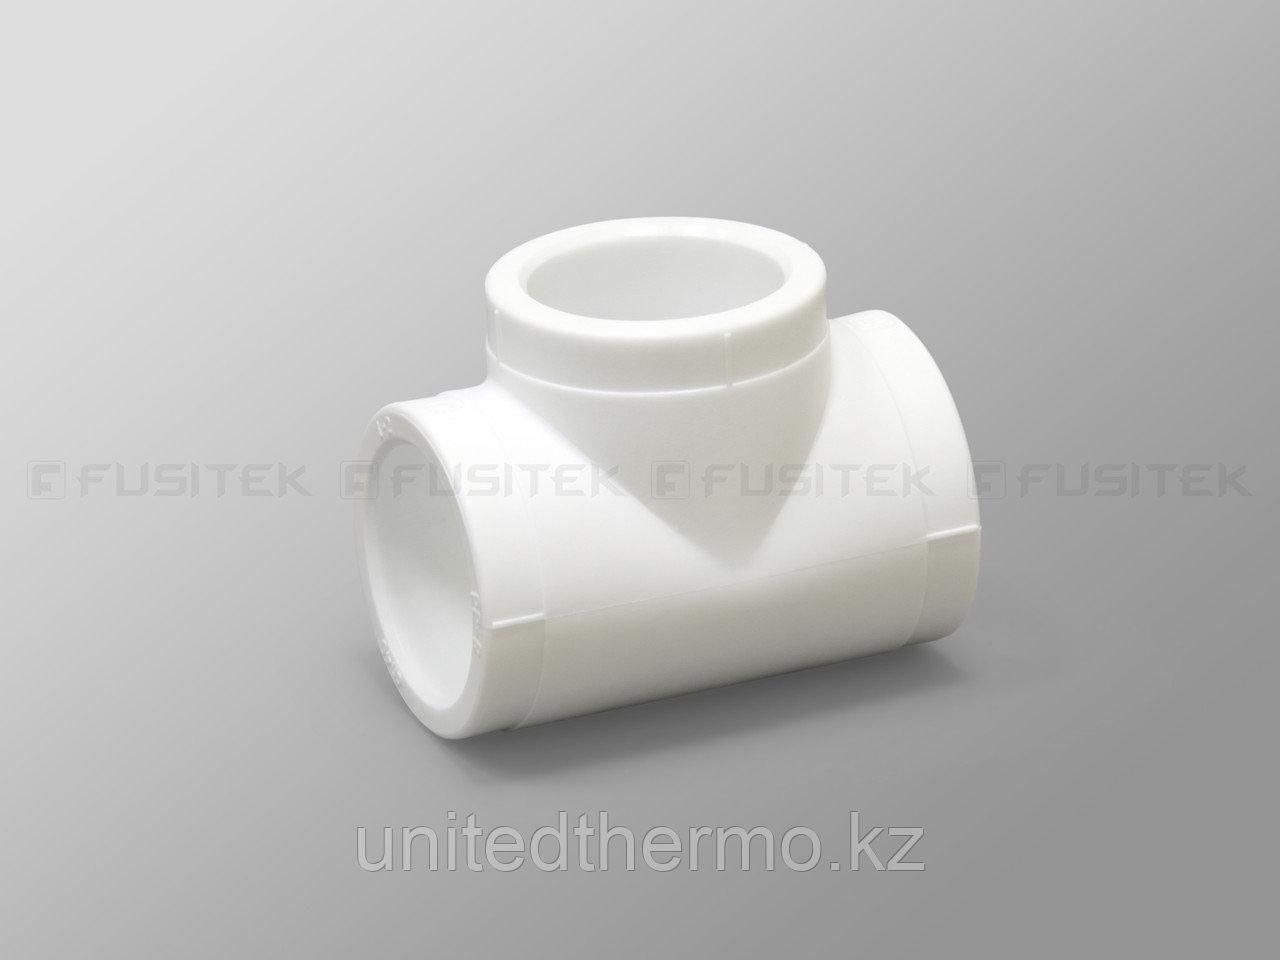 Тройник равносторонний 20 мм Fusitek